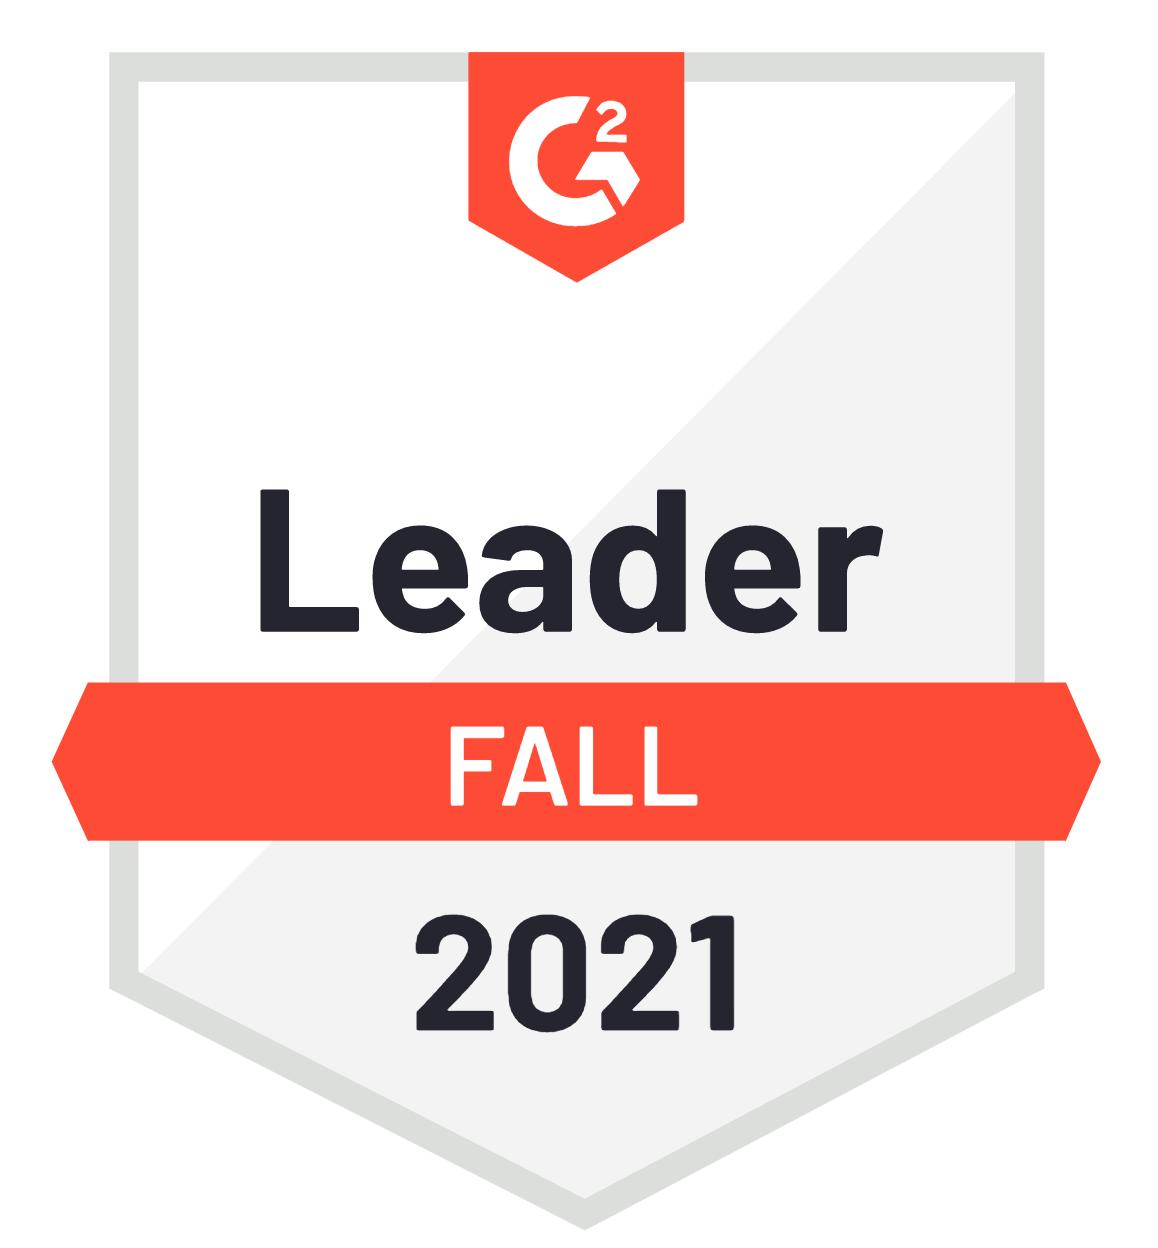 G2 Fall 2021 Leader